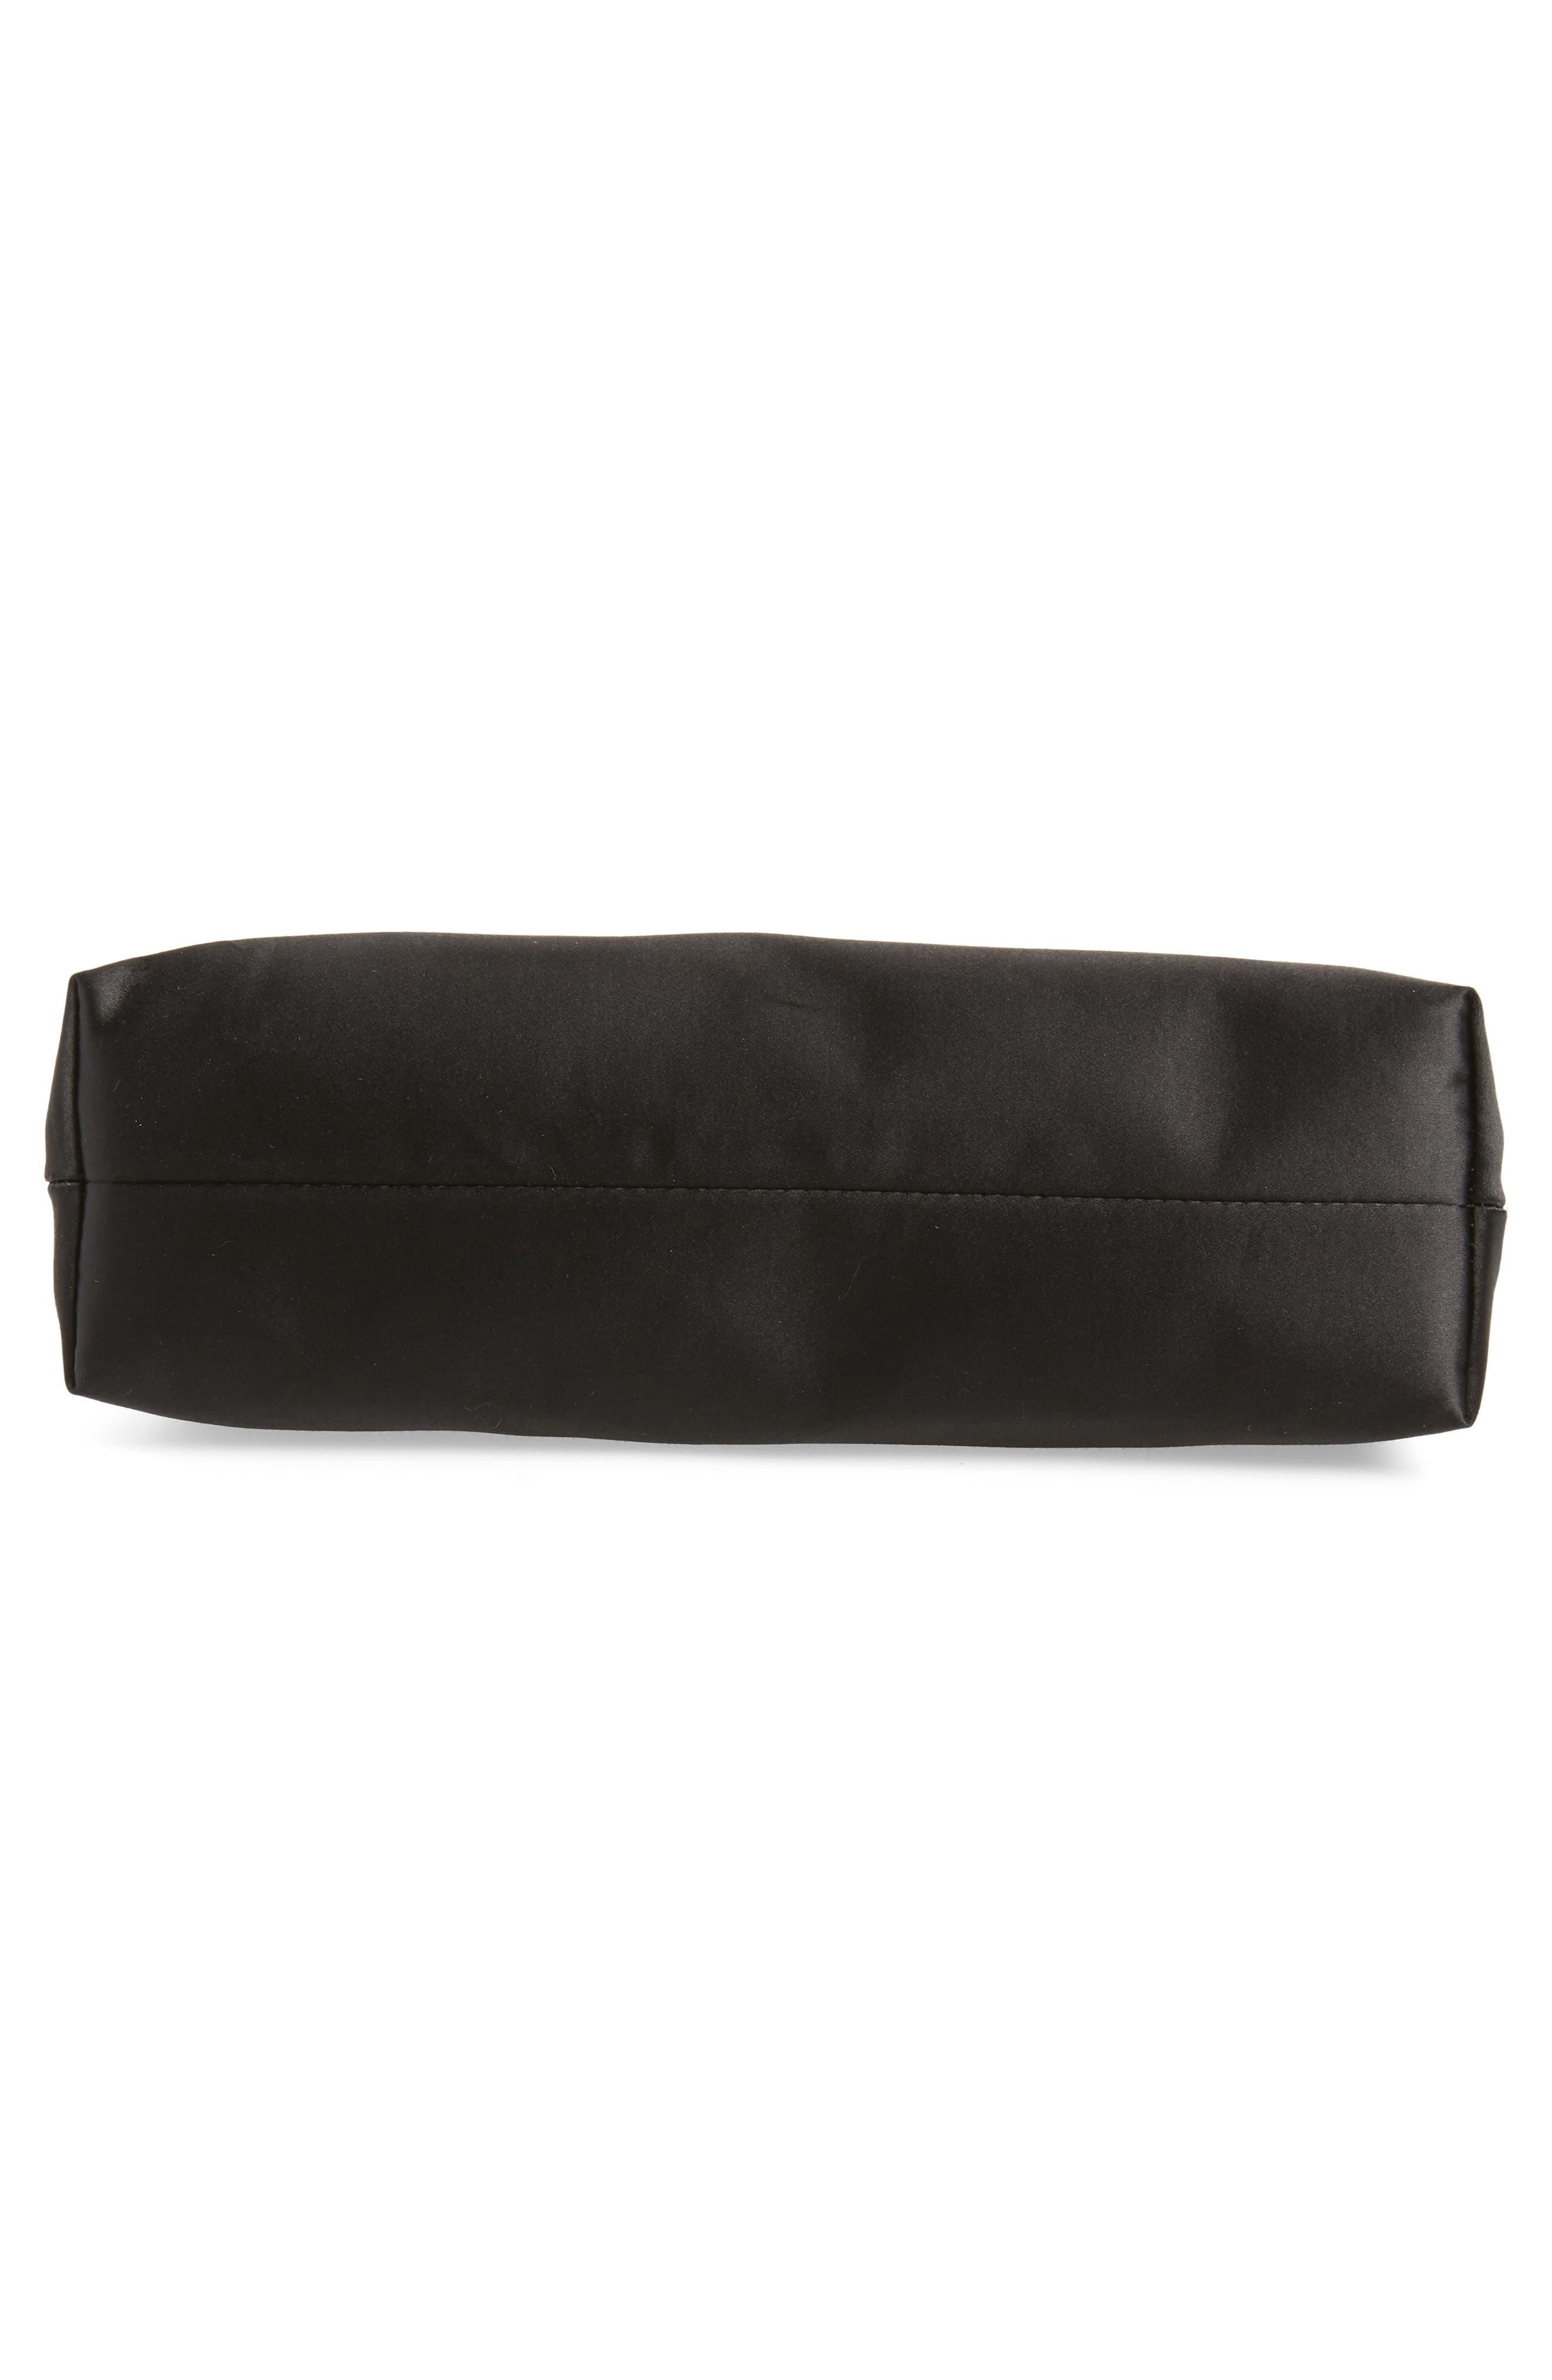 Georgaa Bow Clasp Evening Bag,                             Alternate thumbnail 6, color,                             Black